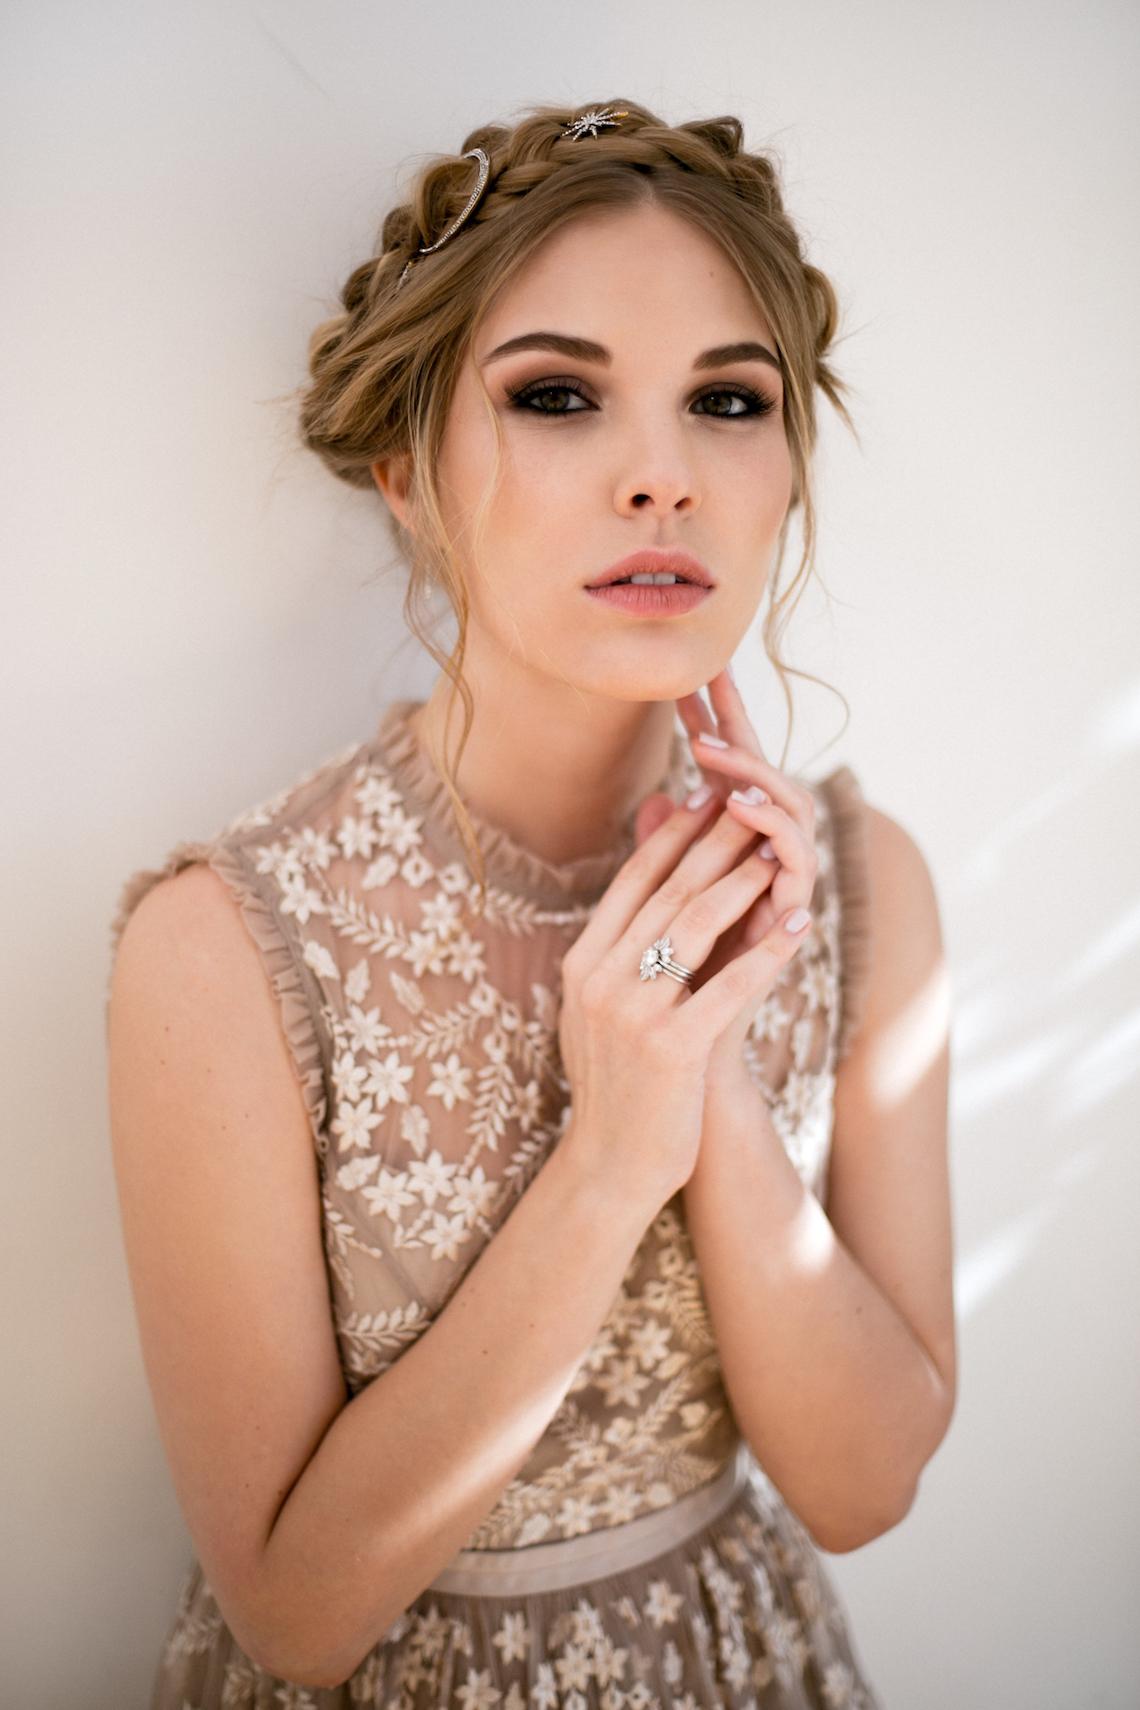 Celestial Ballerina Meets Art Gallery Wedding Inspiration   Alleksana Photography 19